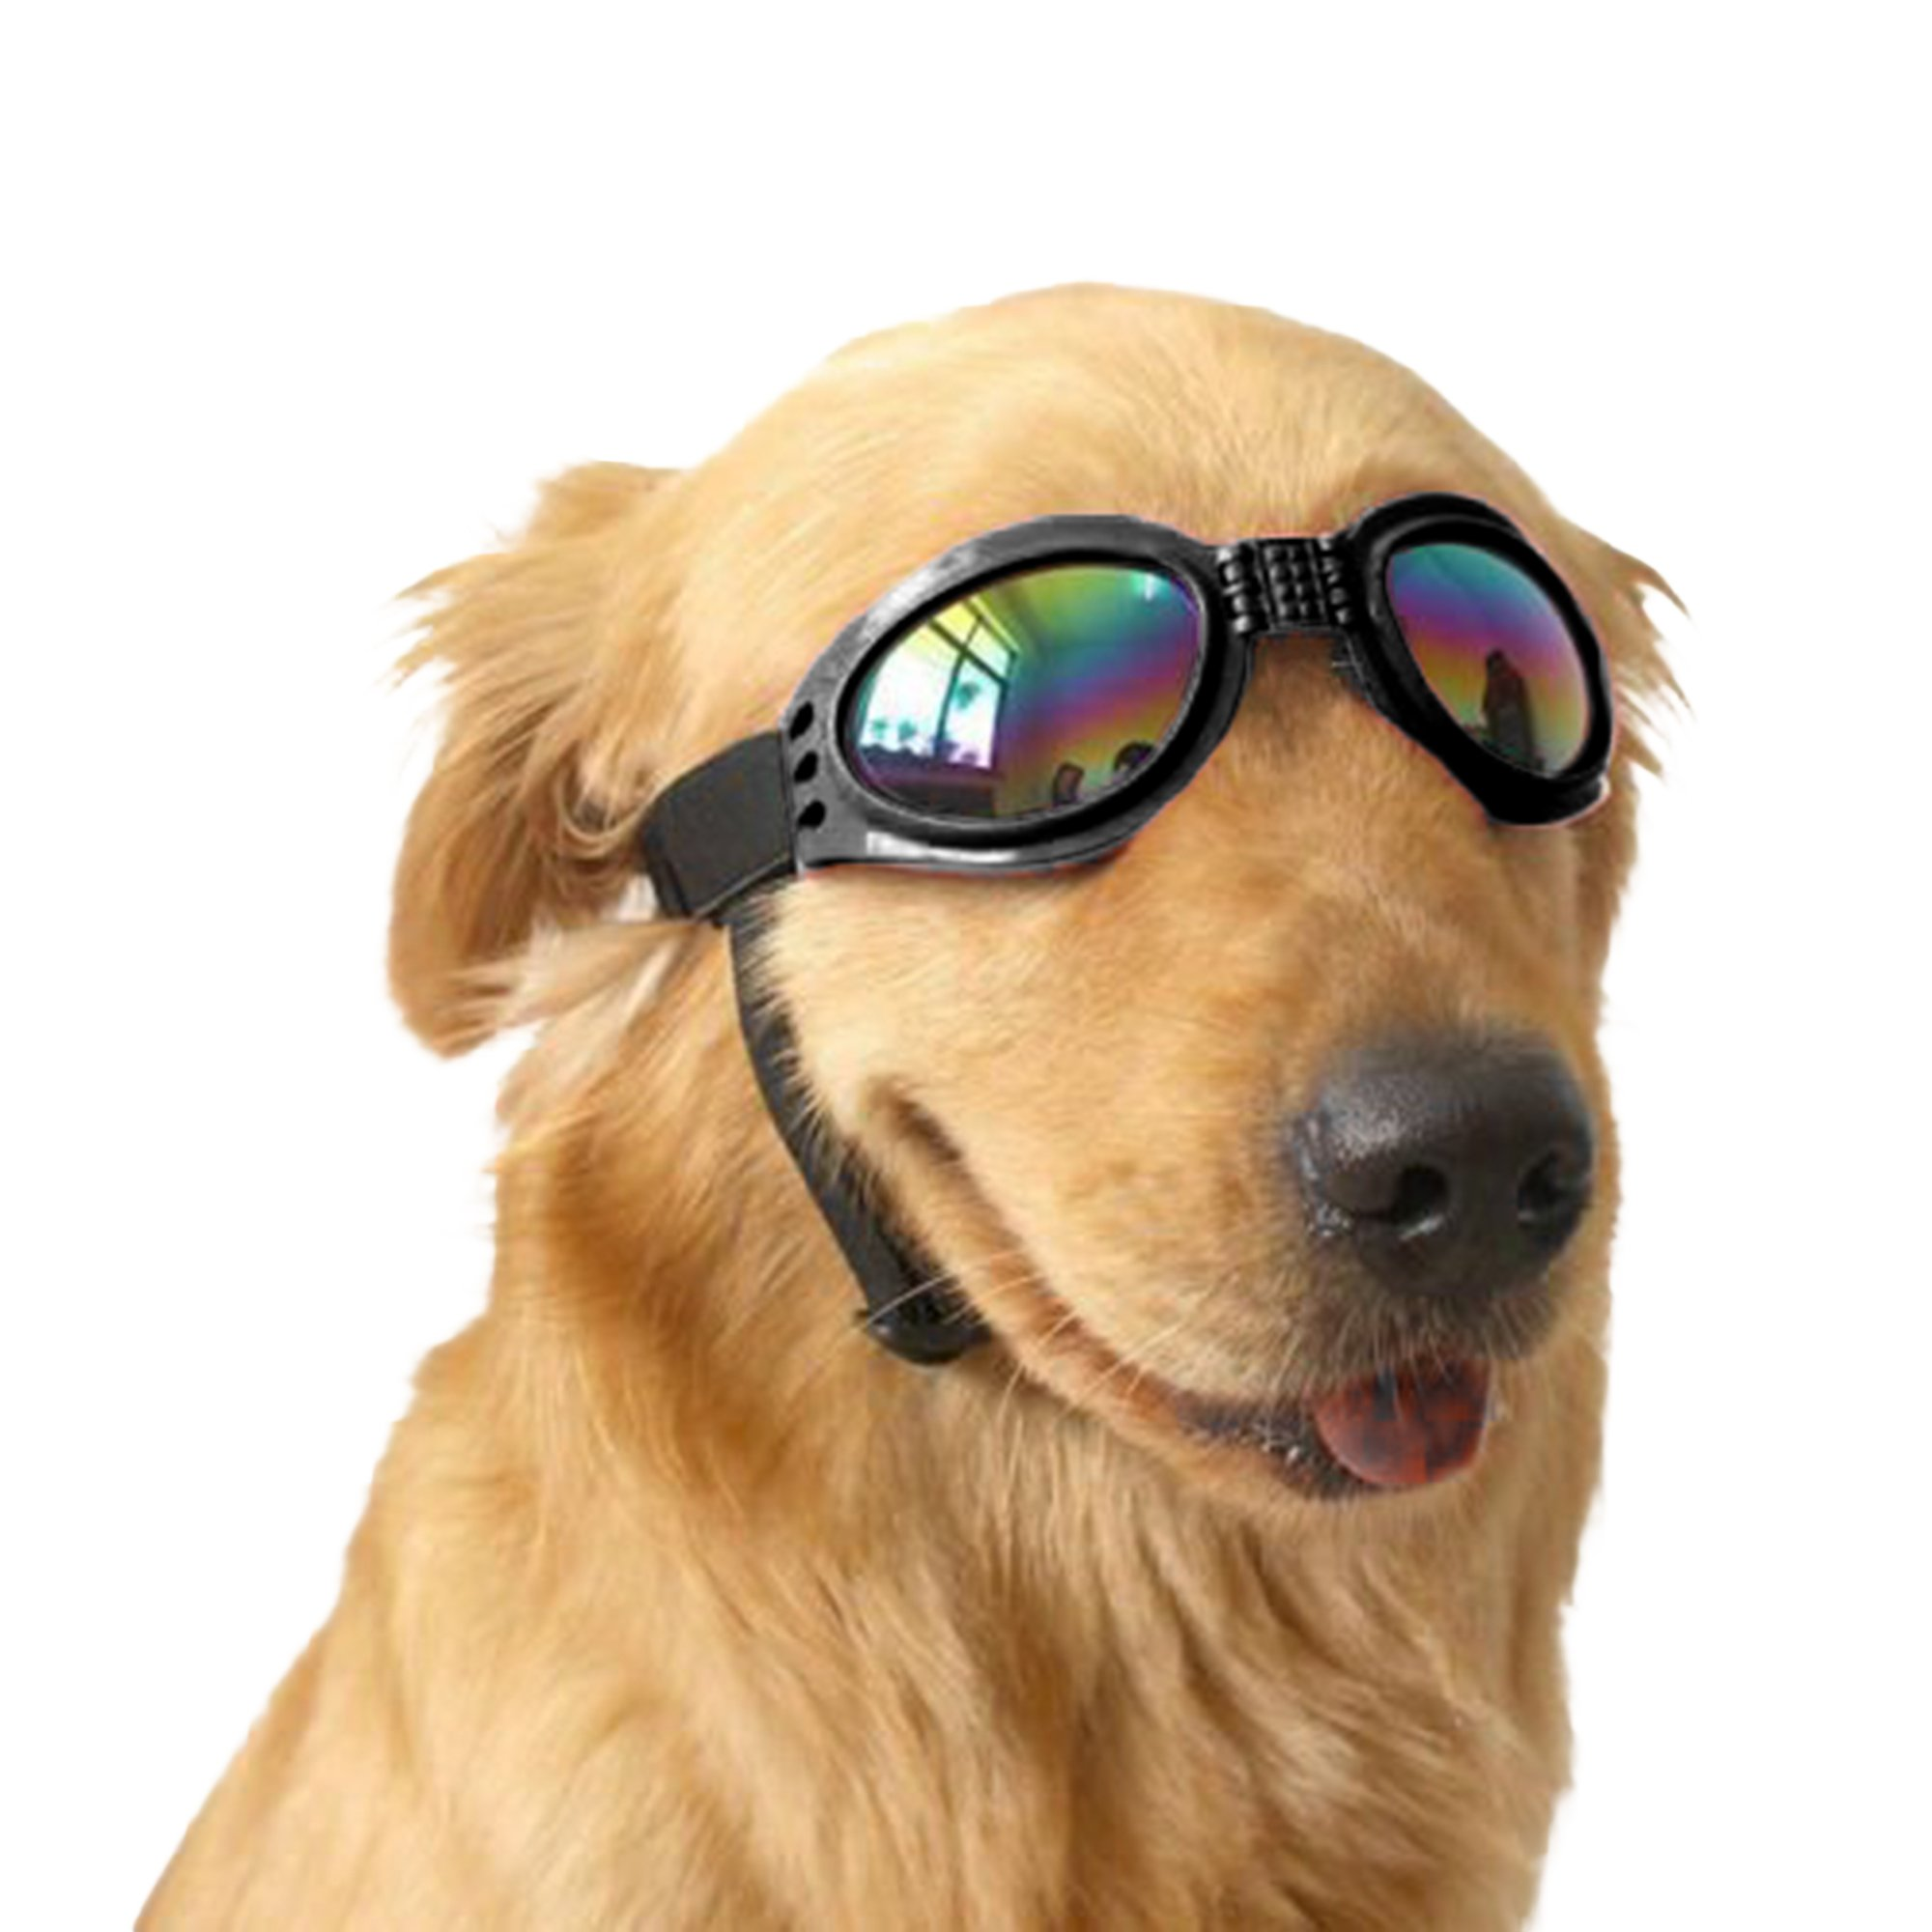 Beautyflier Kloud City Pet Eye Wear Protection Goggles Foldable Adjustable Strap Sunglasses for Dog Outside (Black)